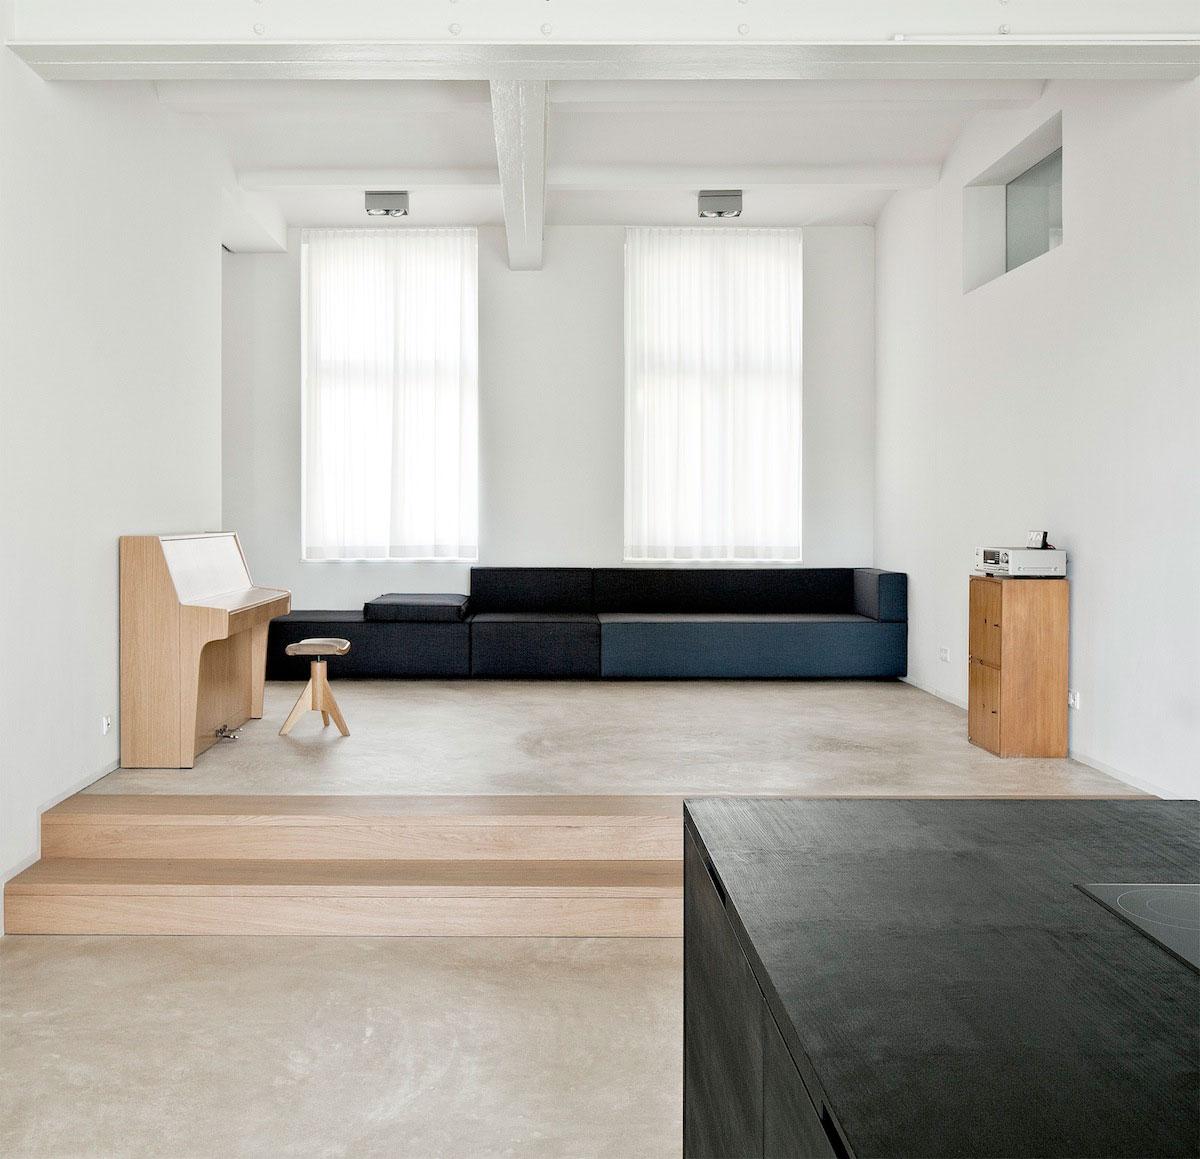 Strakke minimalistische woonkamer interieur inrichting for Interieur inrichting